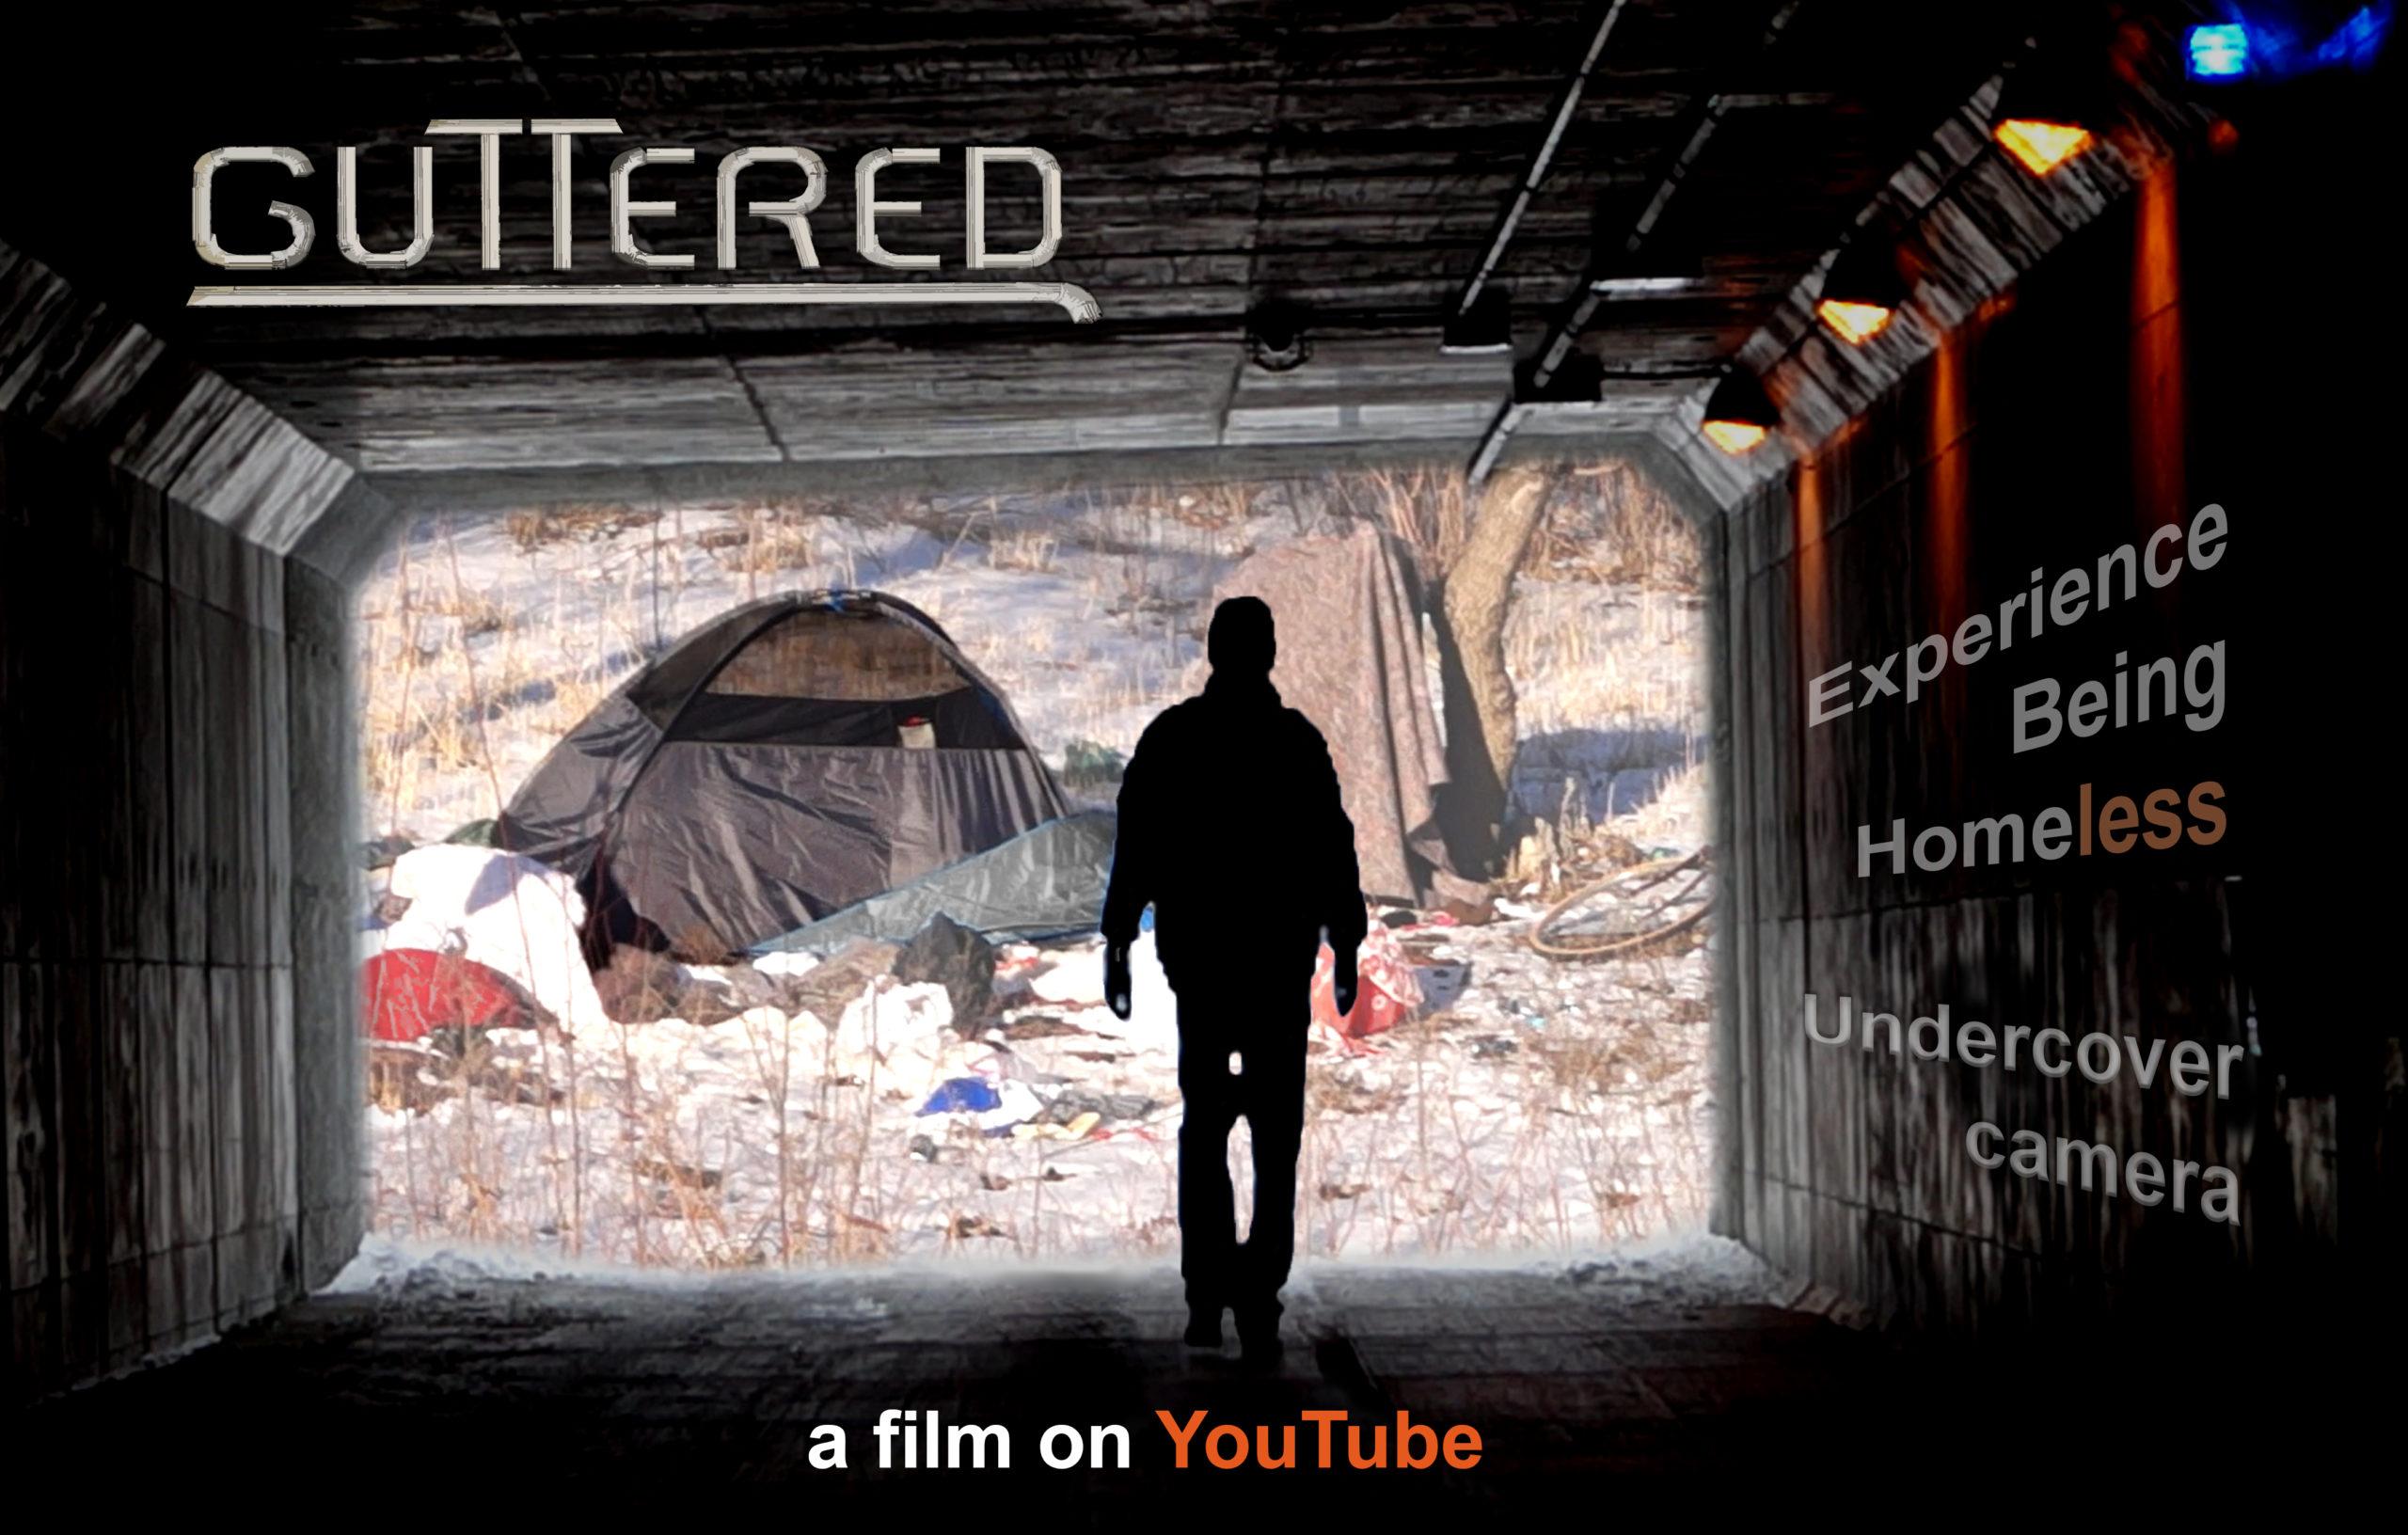 guttered poster3b